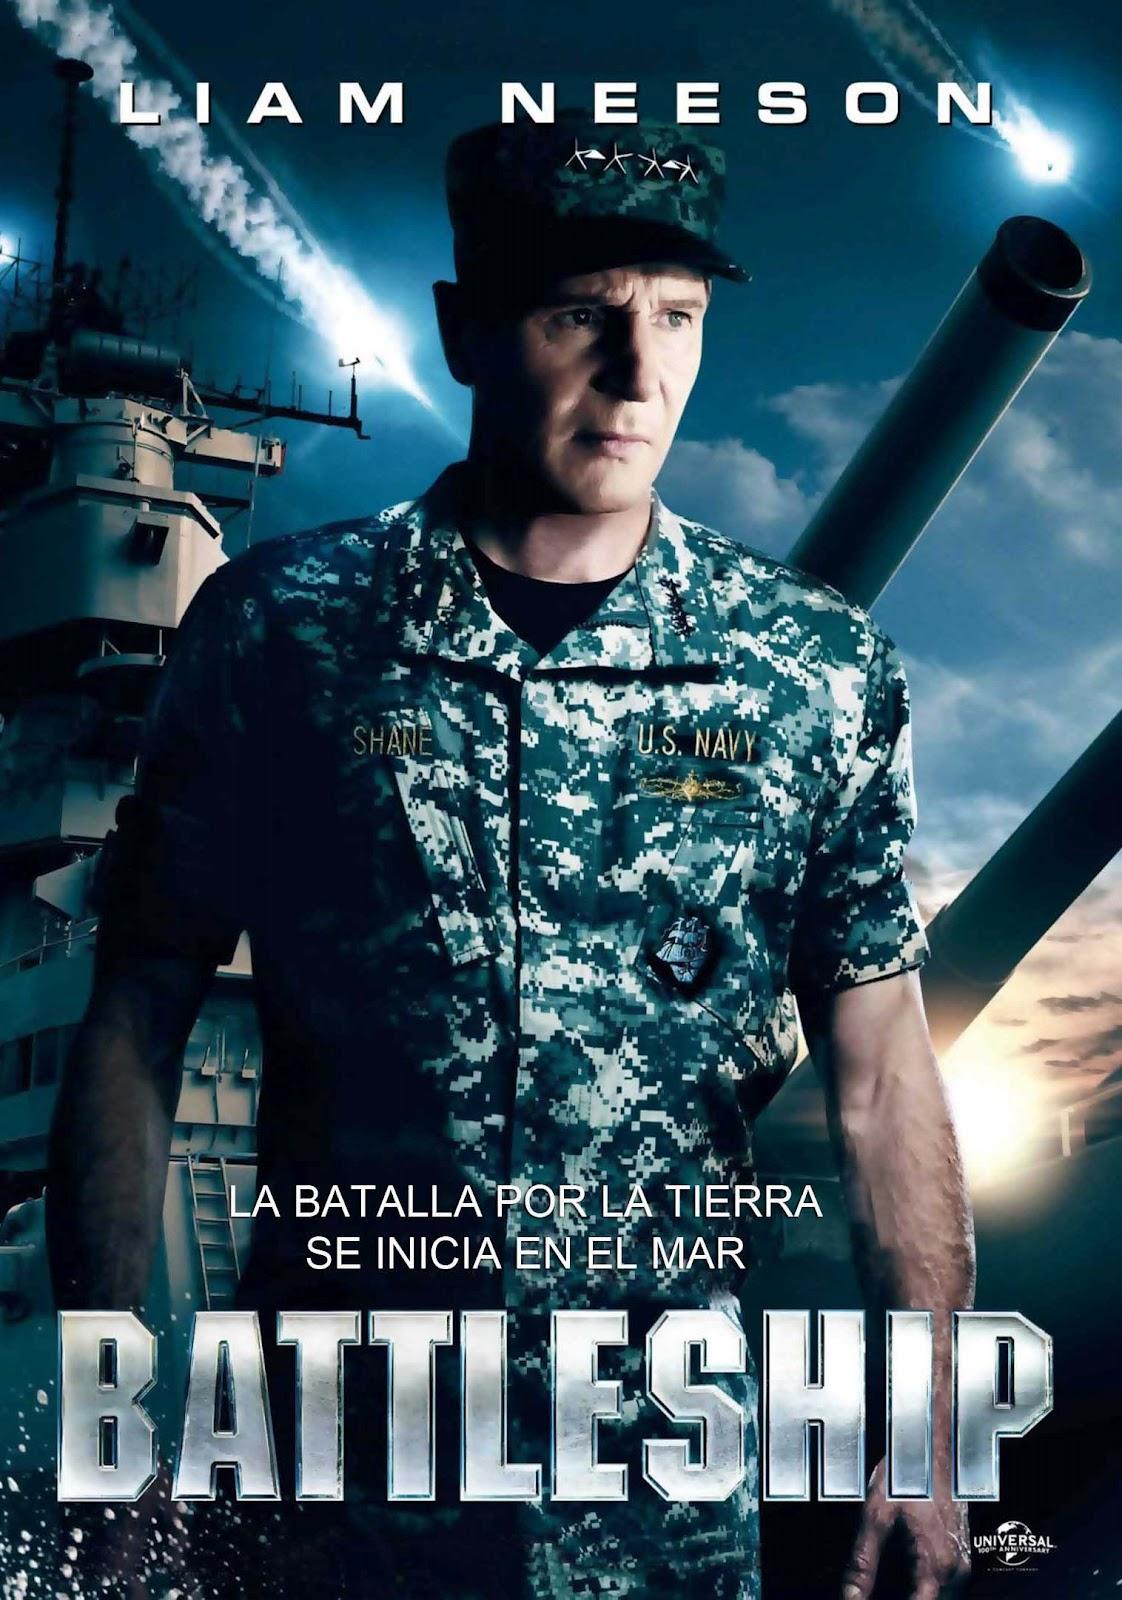 http://3.bp.blogspot.com/-9iaDkenWwPc/UBwqT_pX8WI/AAAAAAAABcg/eQOk1JC-038/s1600/Battleship.jpg